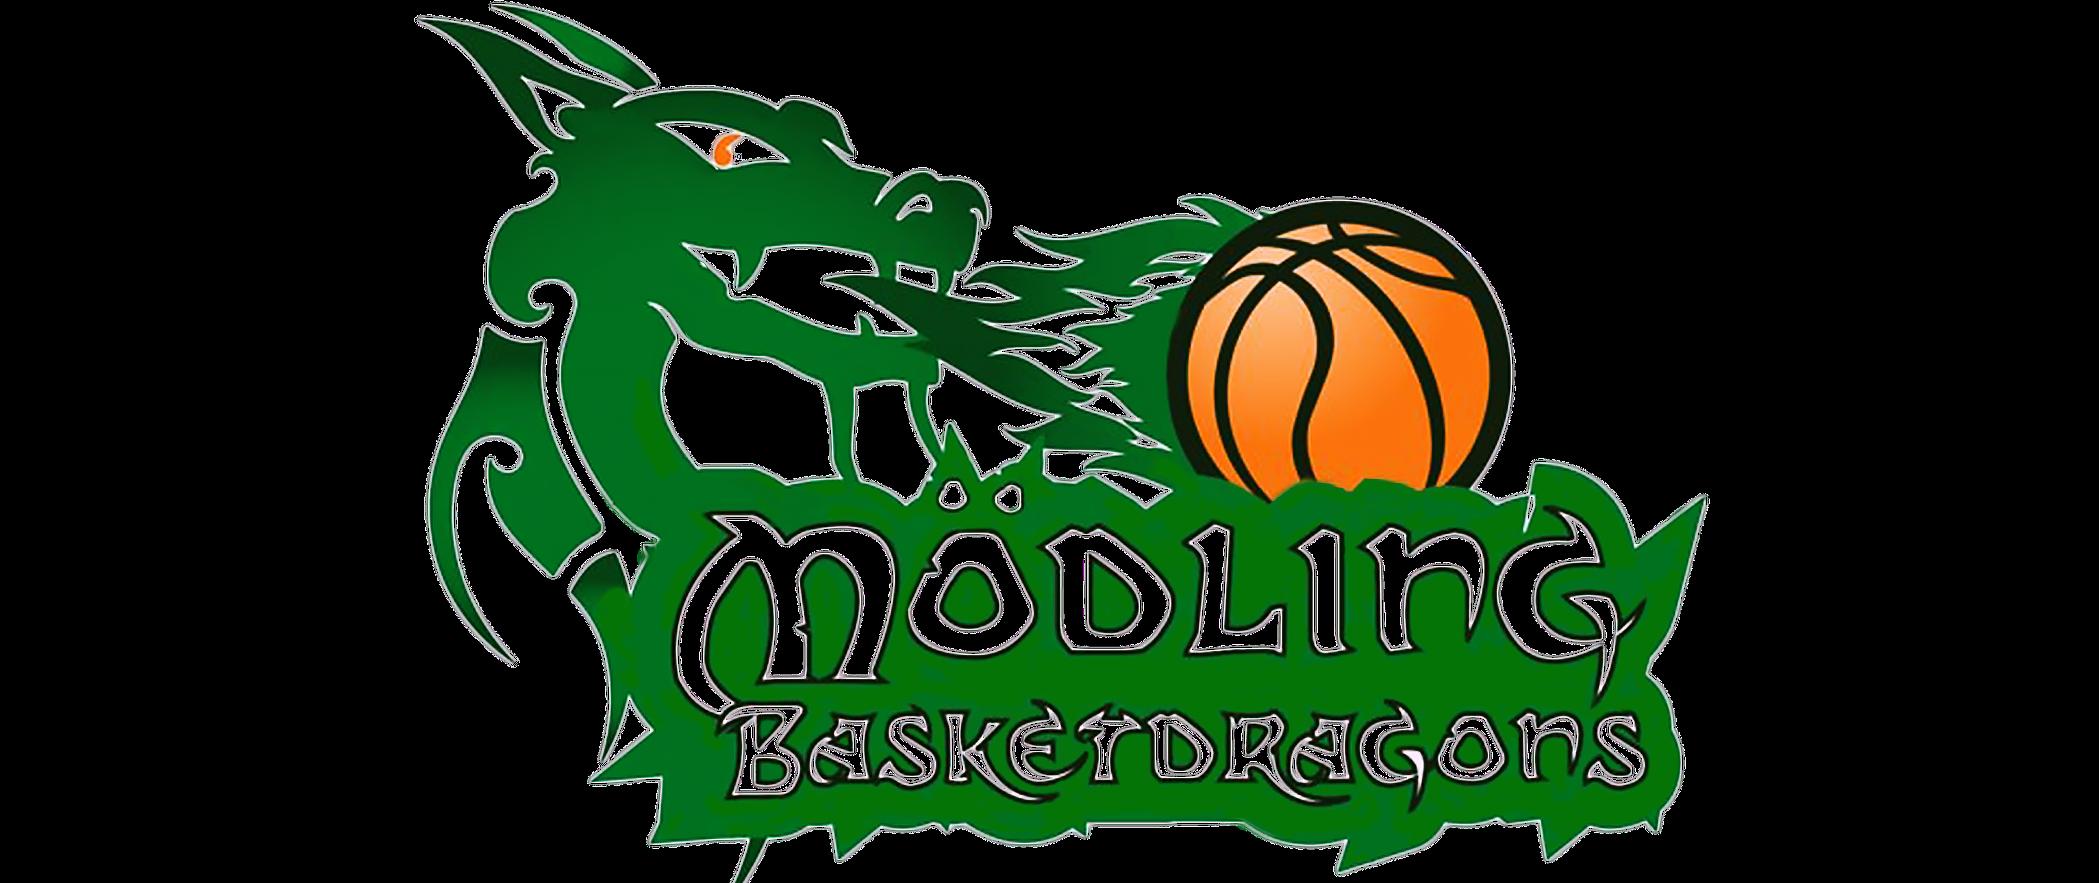 Basketdragons Mödling